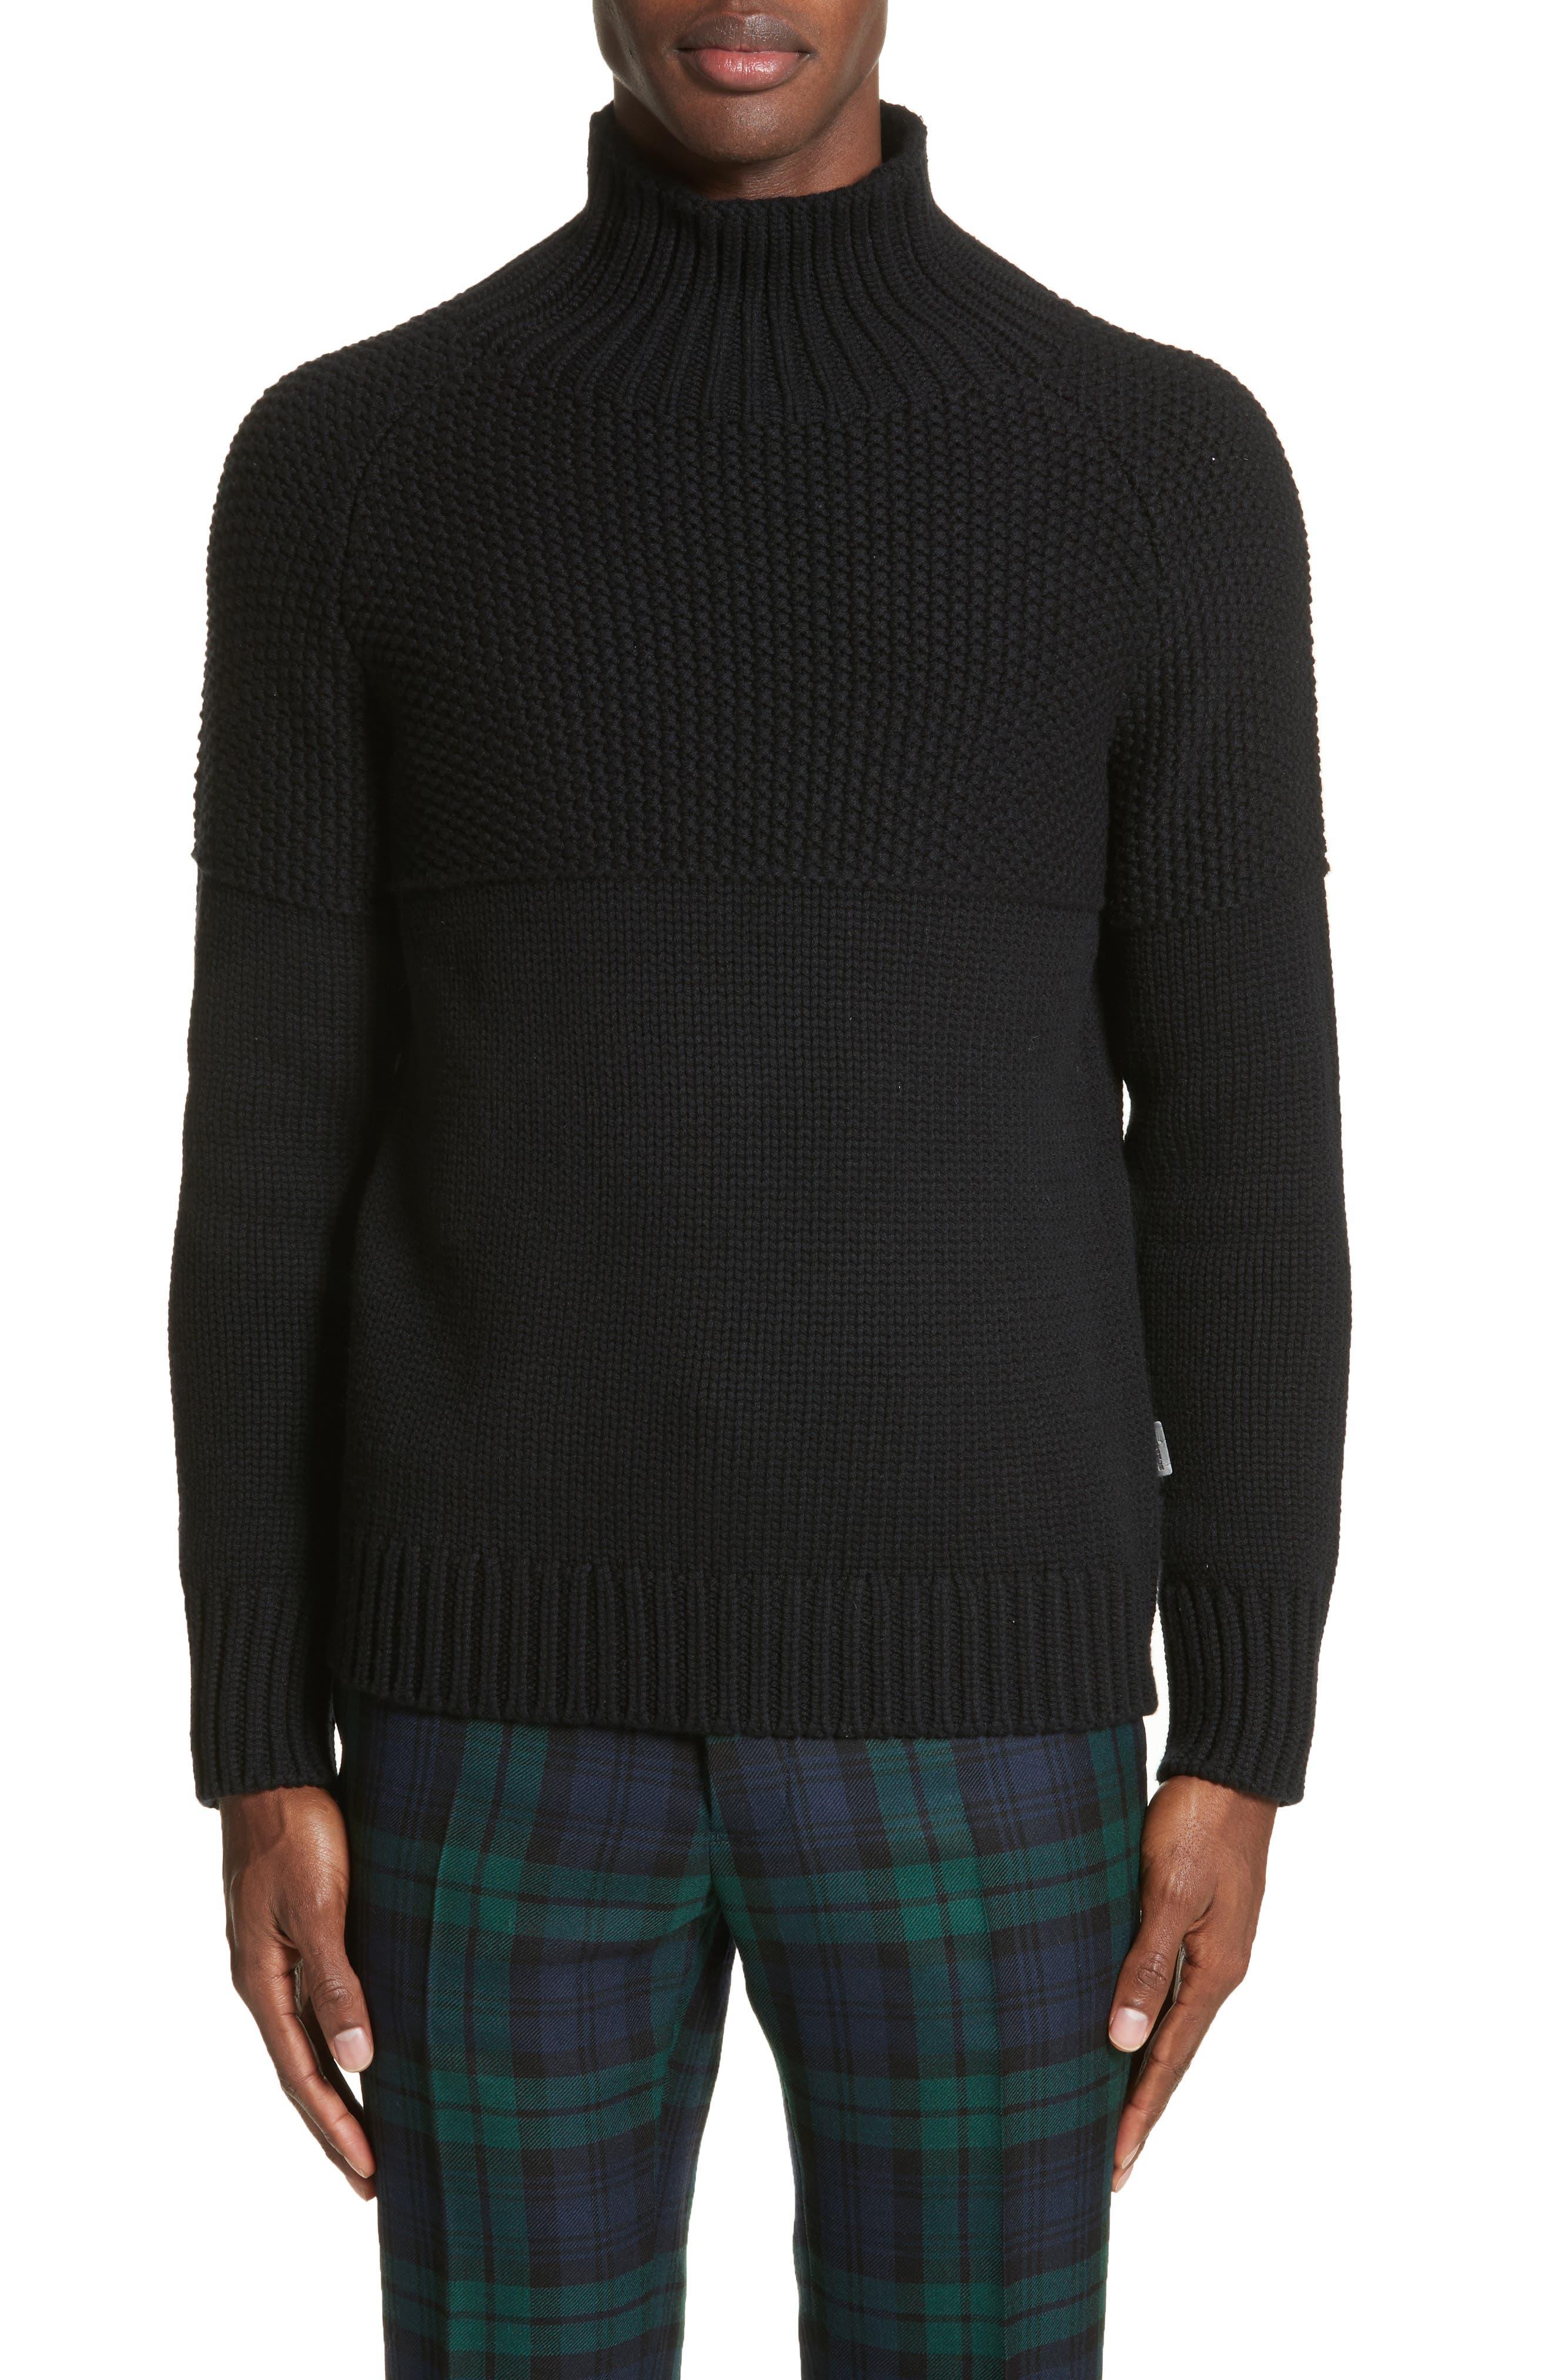 Burberry Dawson Cashmere Turtleneck Sweater